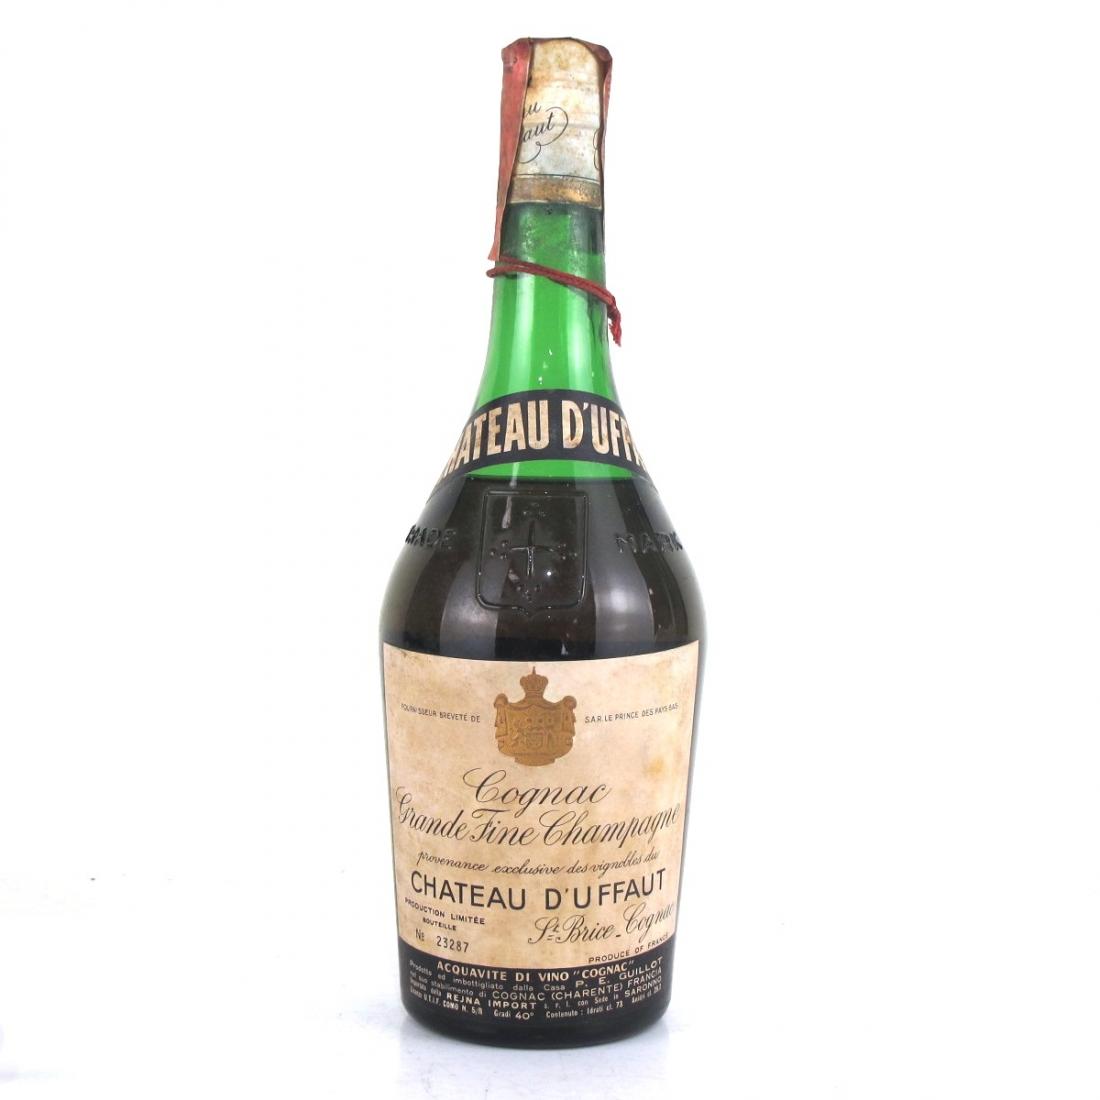 Chateau D'Uffaut Grande Fine Champagne Cognac 1970s